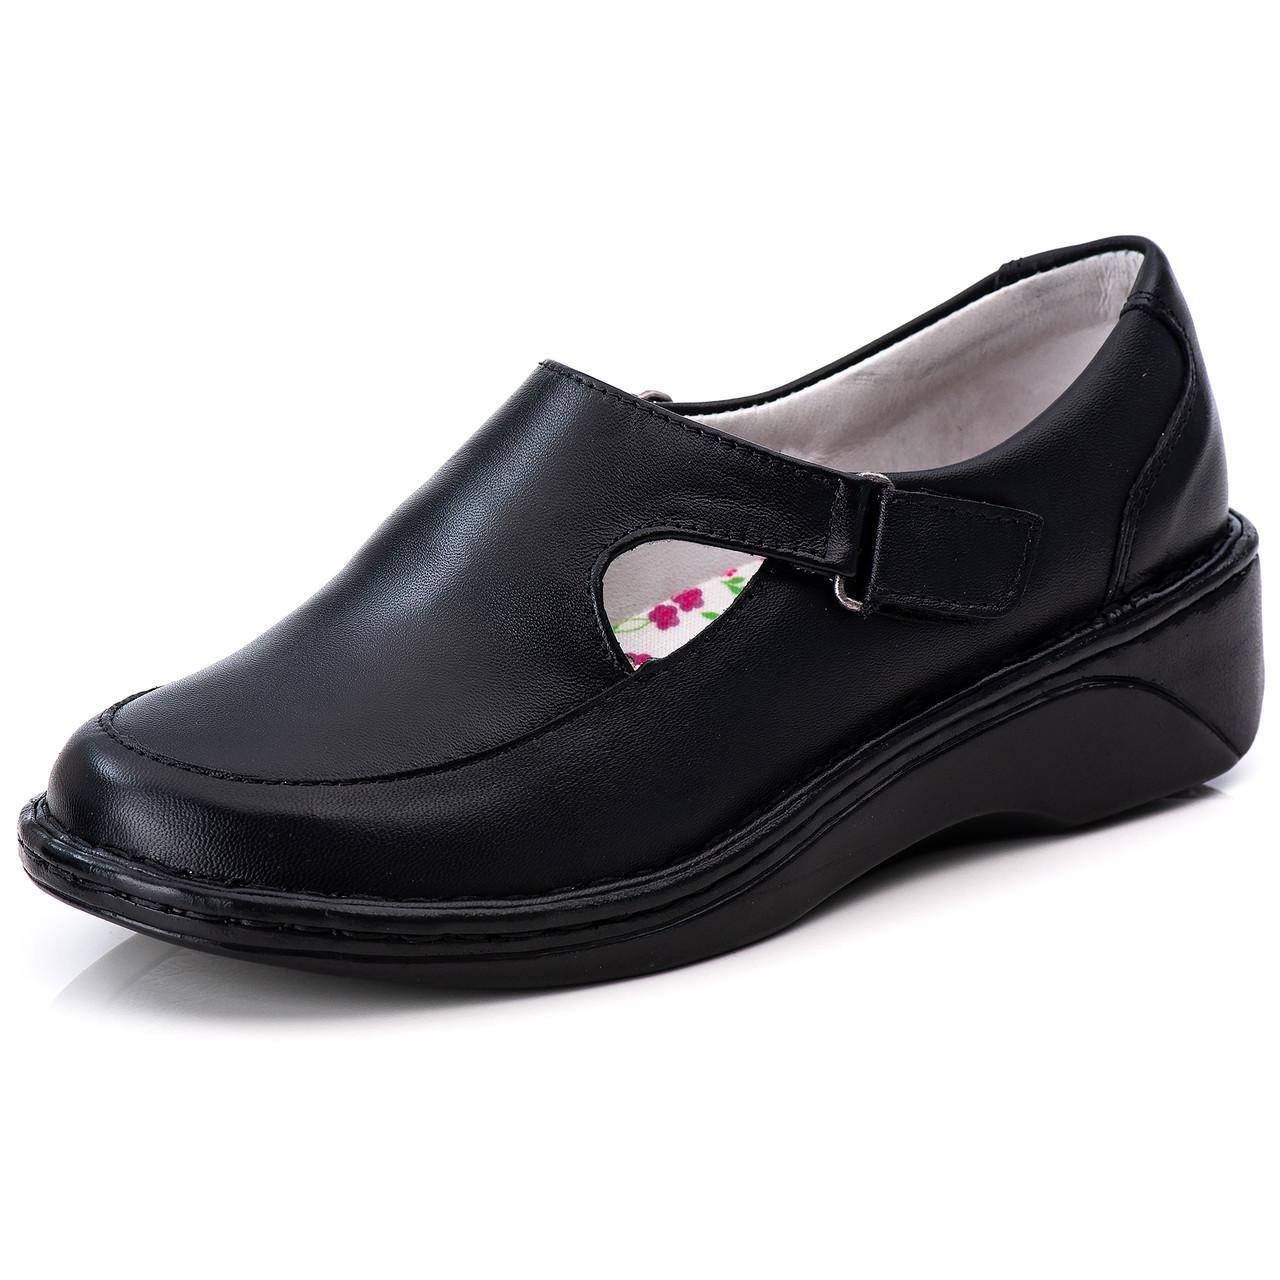 Sapato Antstress Feminino em Couro Legitimo F-210